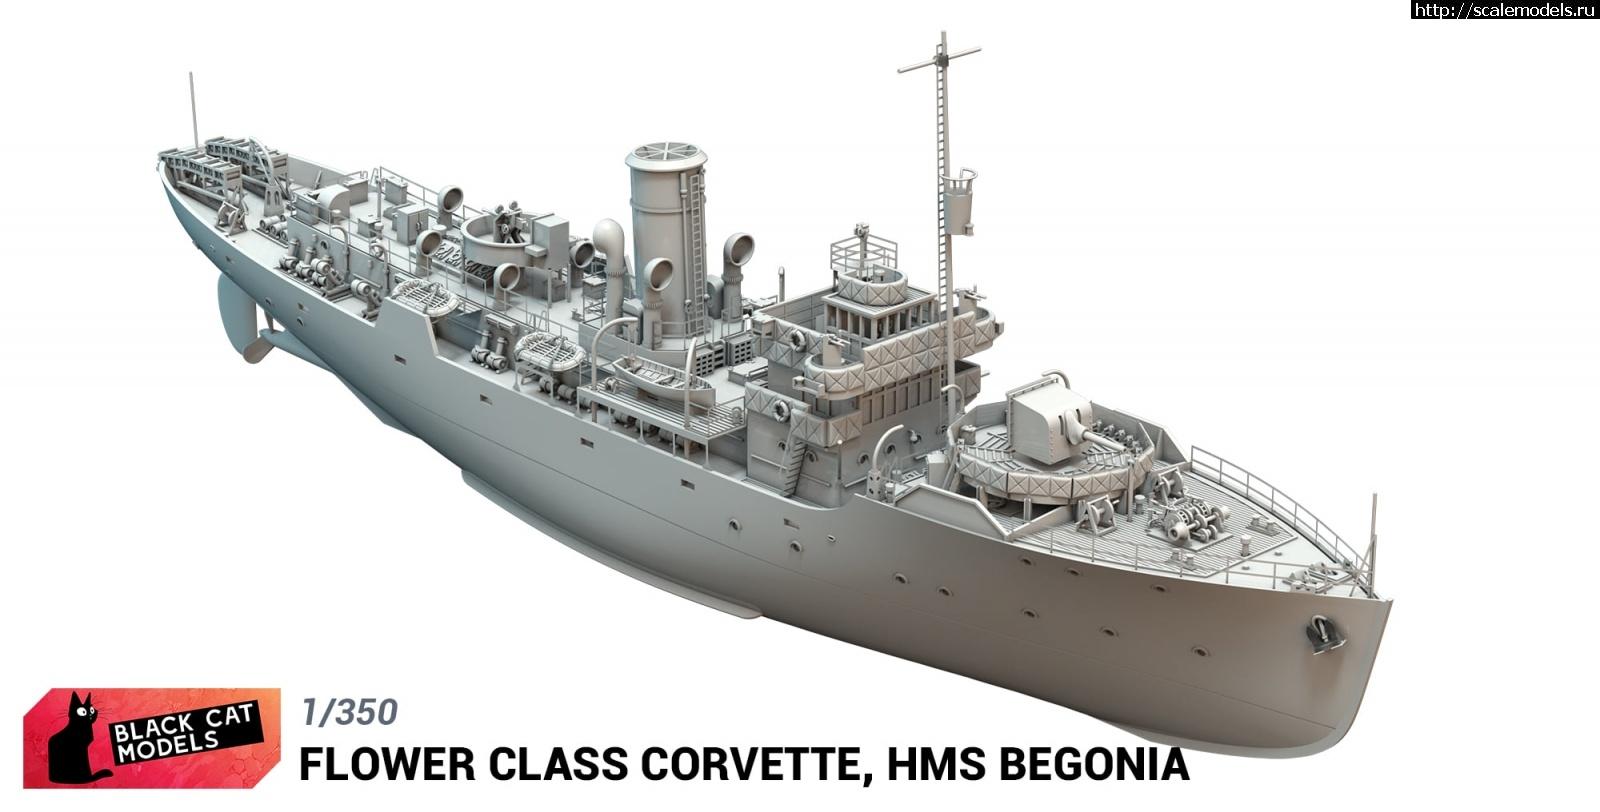 Анонс Black Cat Models 1/350 корвет HMS Begonia типа Flower Закрыть окно